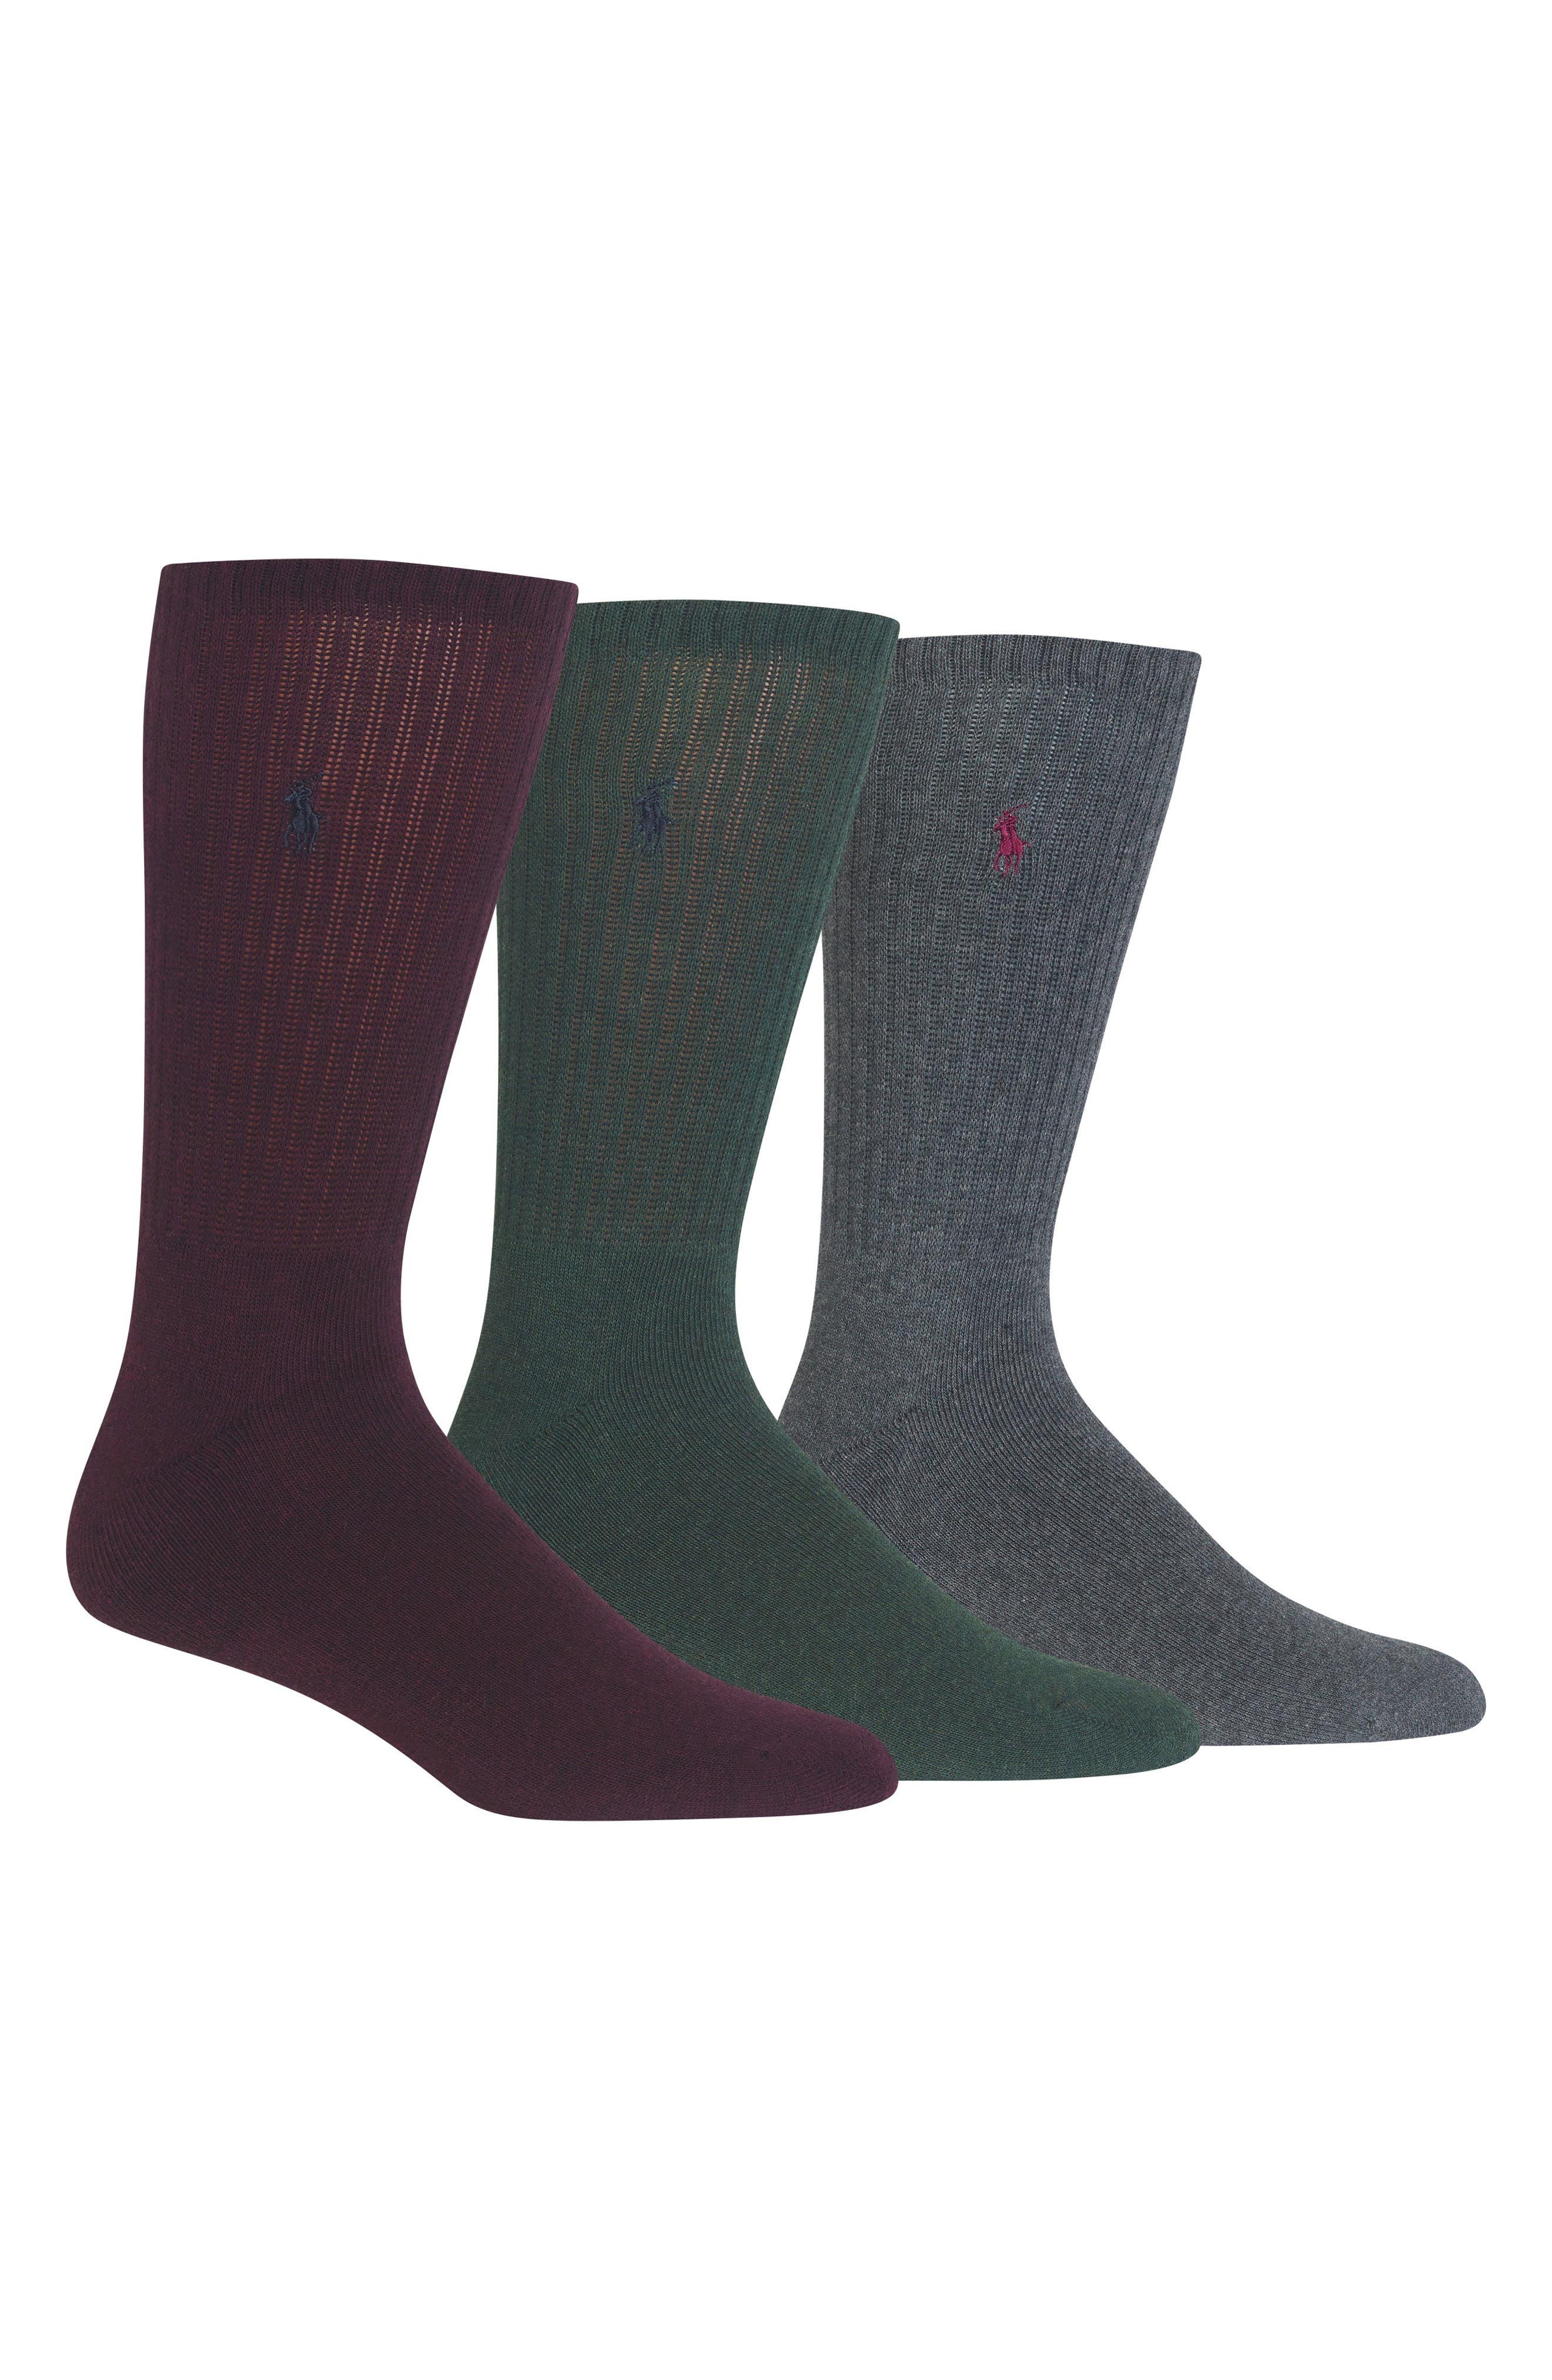 3-Pack Crew Socks,                         Main,                         color, WINE